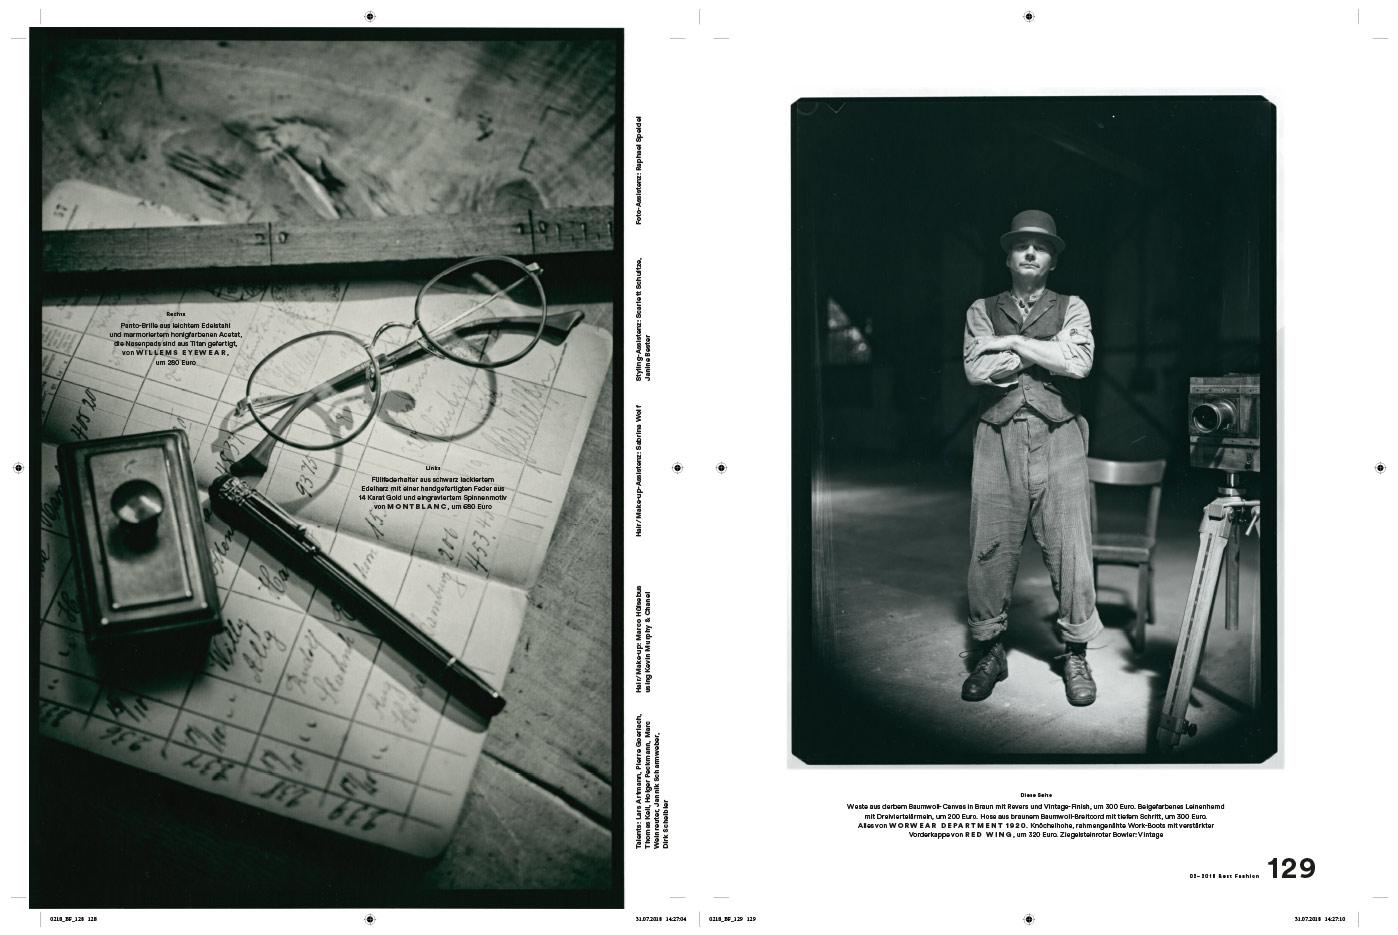 Bettina-Lewin-Photographer-and-Director-MUSS-SITZEN-3